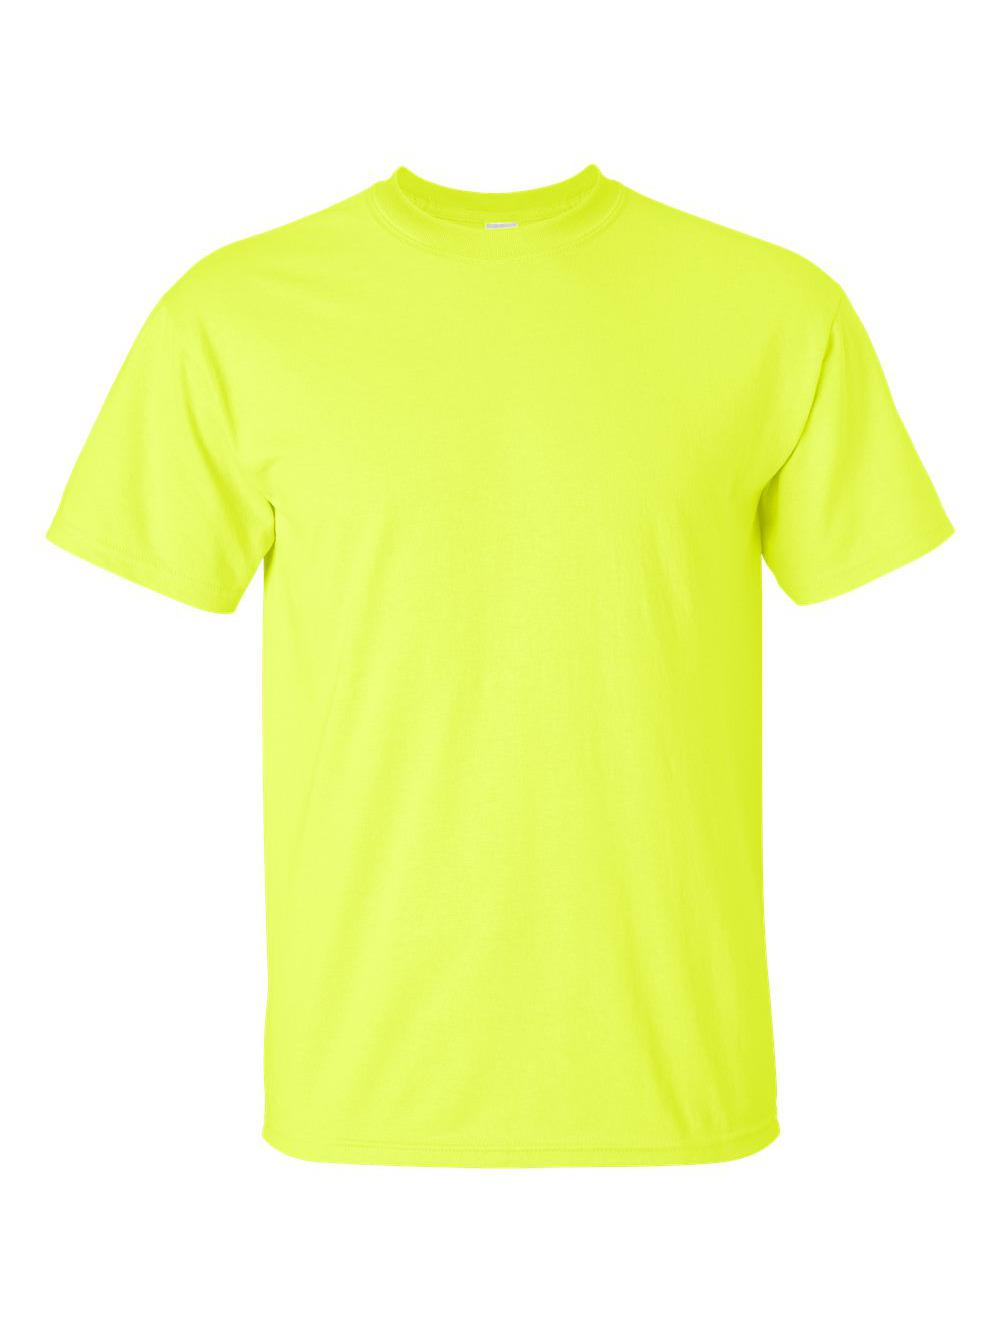 Gildan-Ultra-Cotton-T-Shirt-Tall-Sizes-2000T thumbnail 18